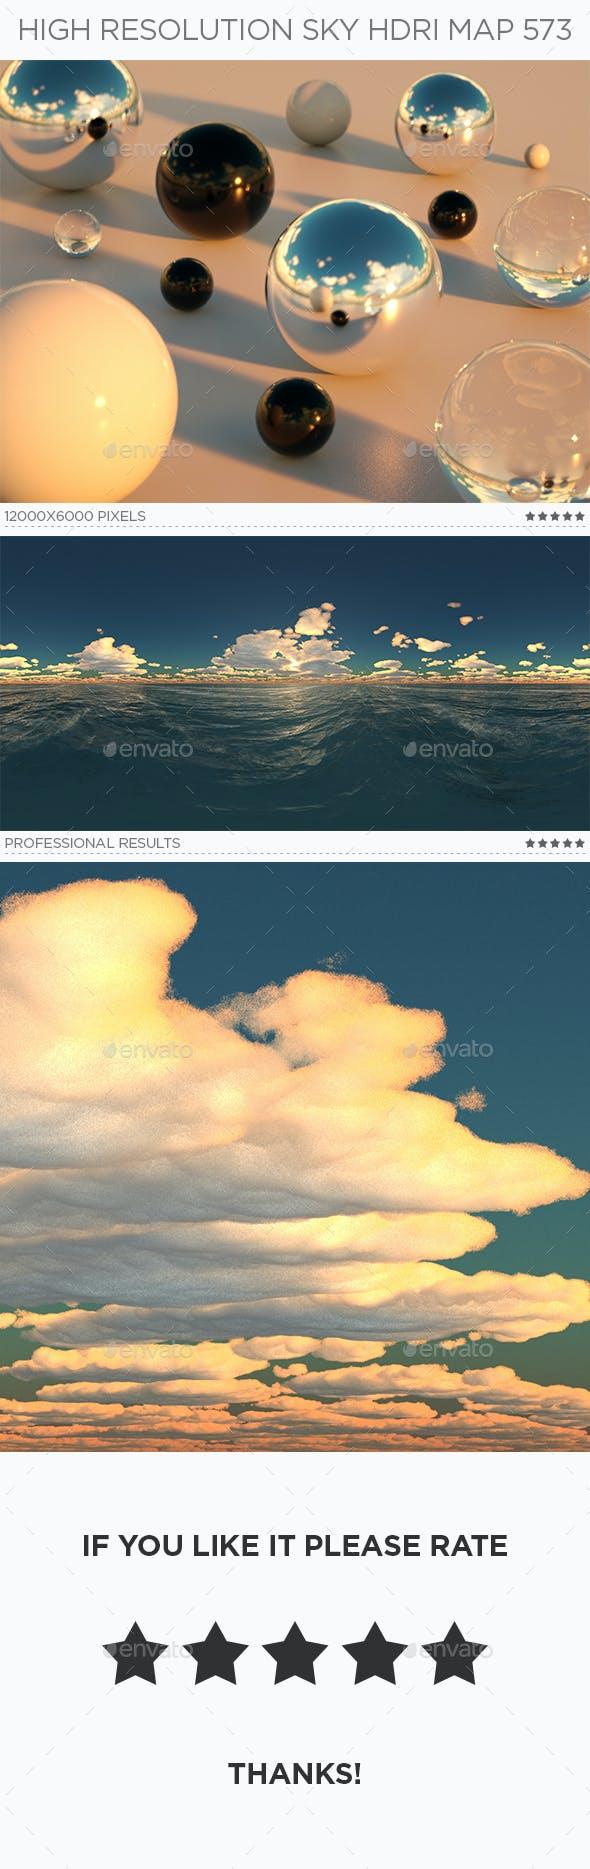 High Resolution Sky HDRi Map 573 - 3DOcean Item for Sale